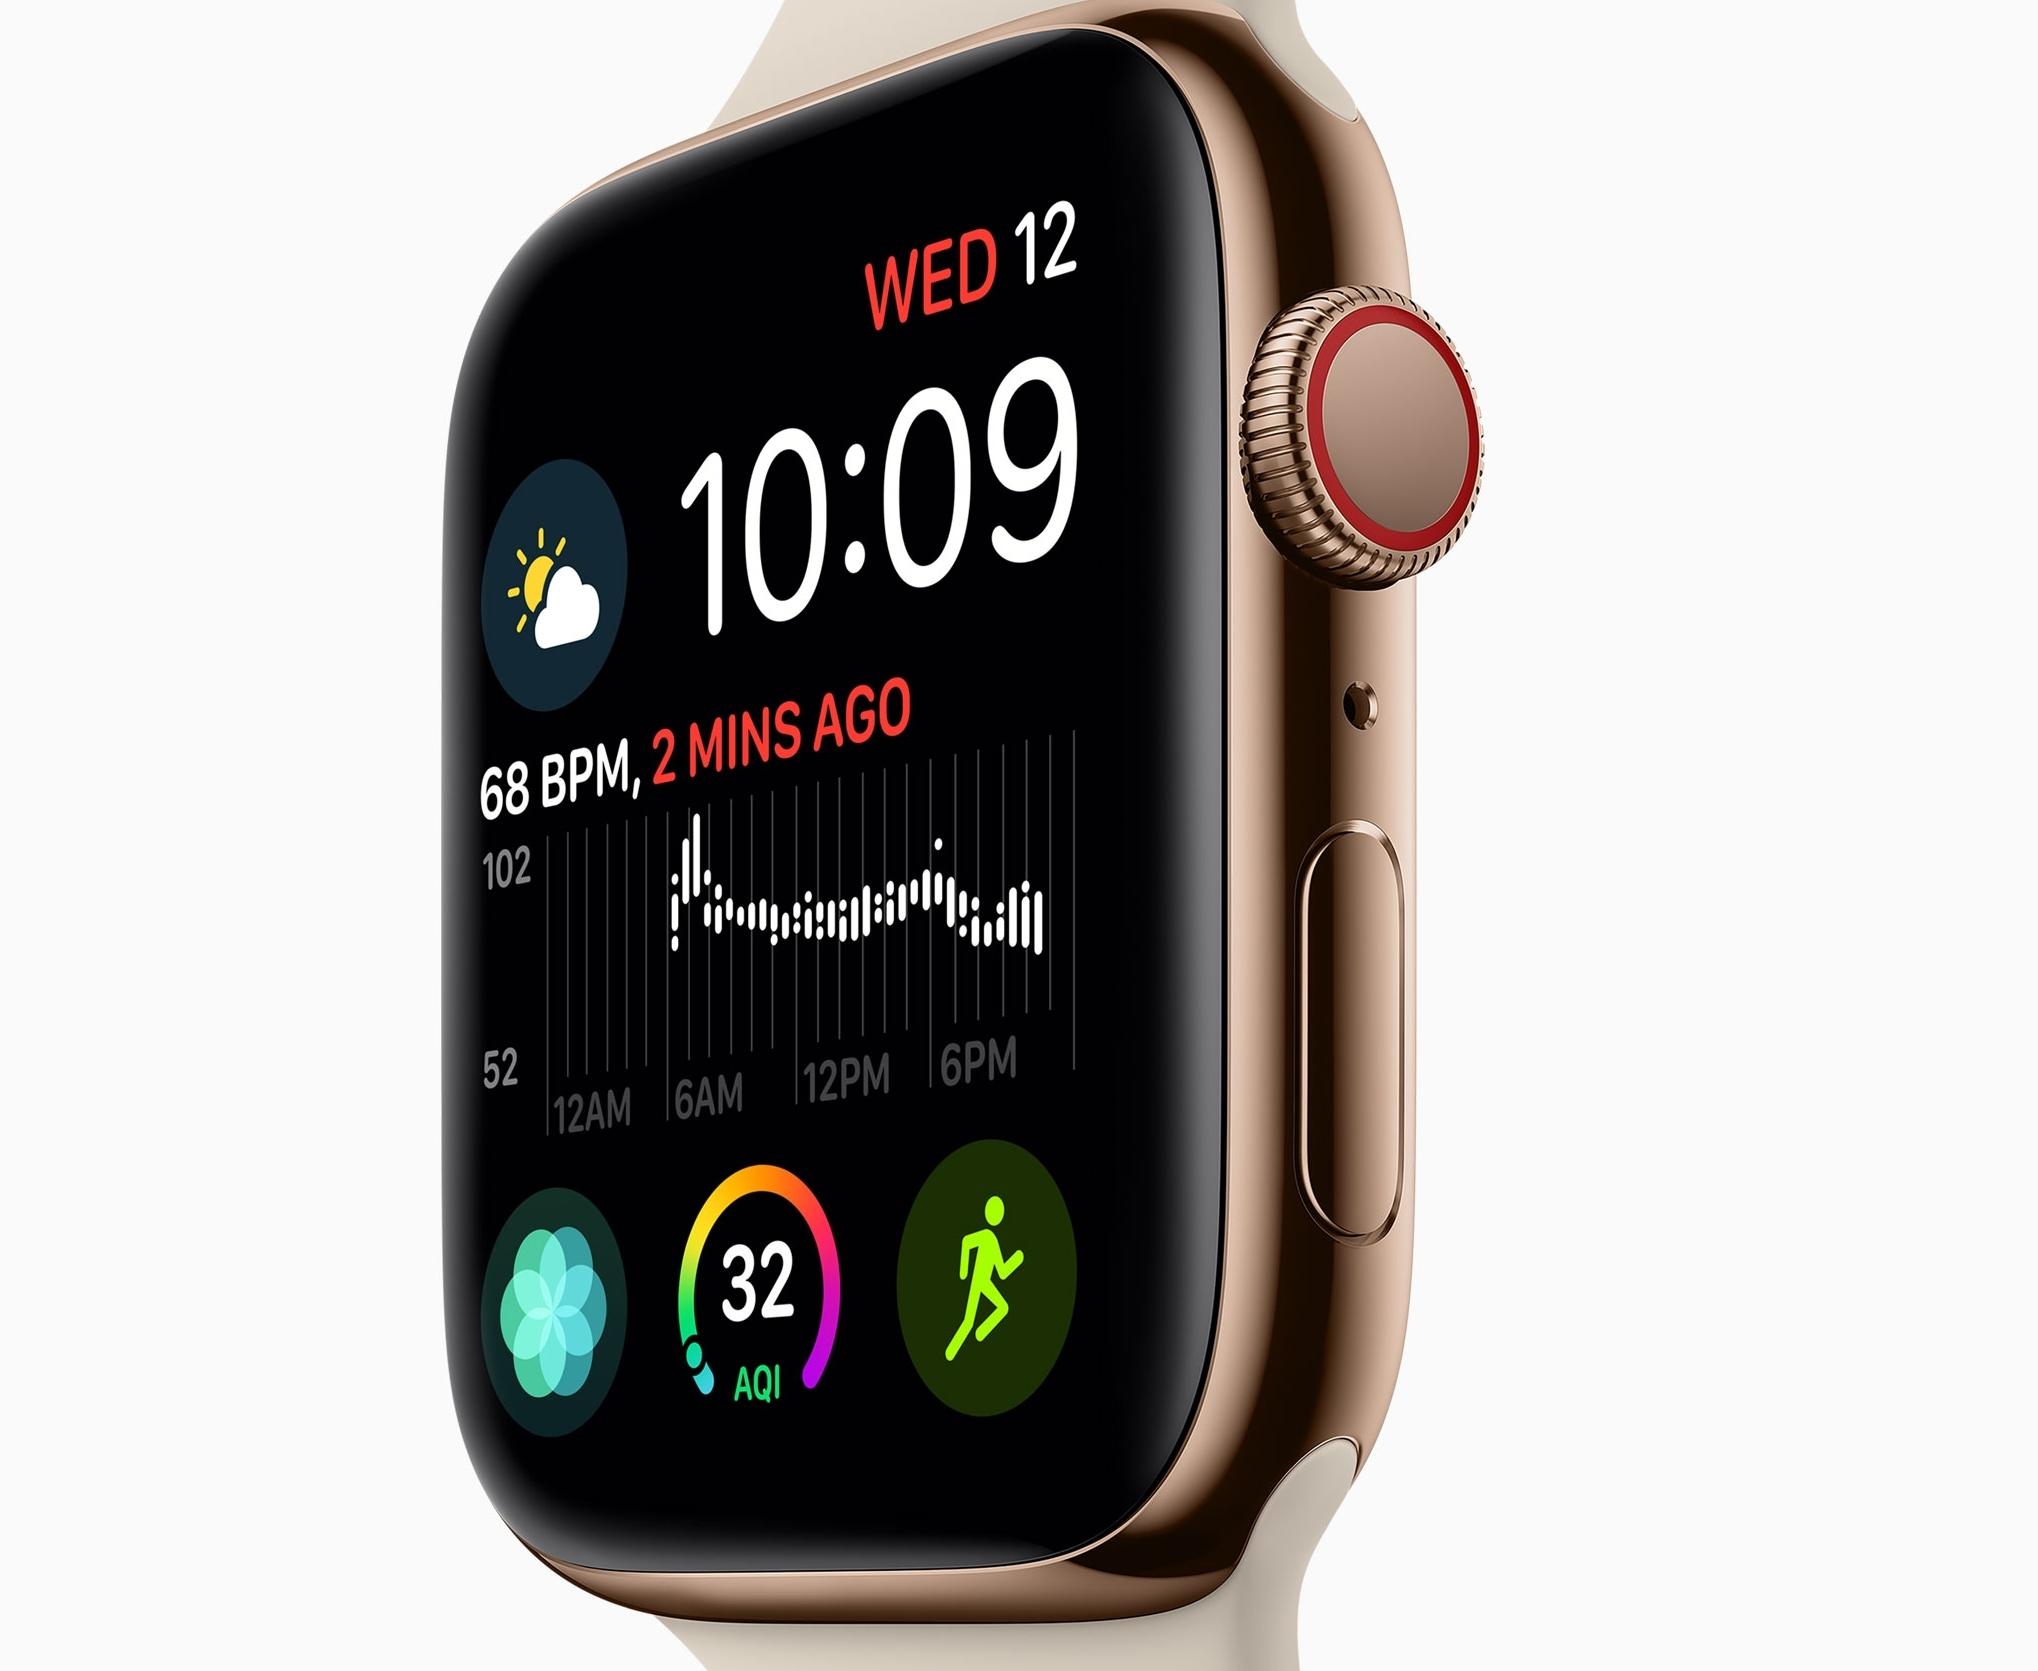 Apple Watch LTE kan komme til Norge kjappere enn vi tror